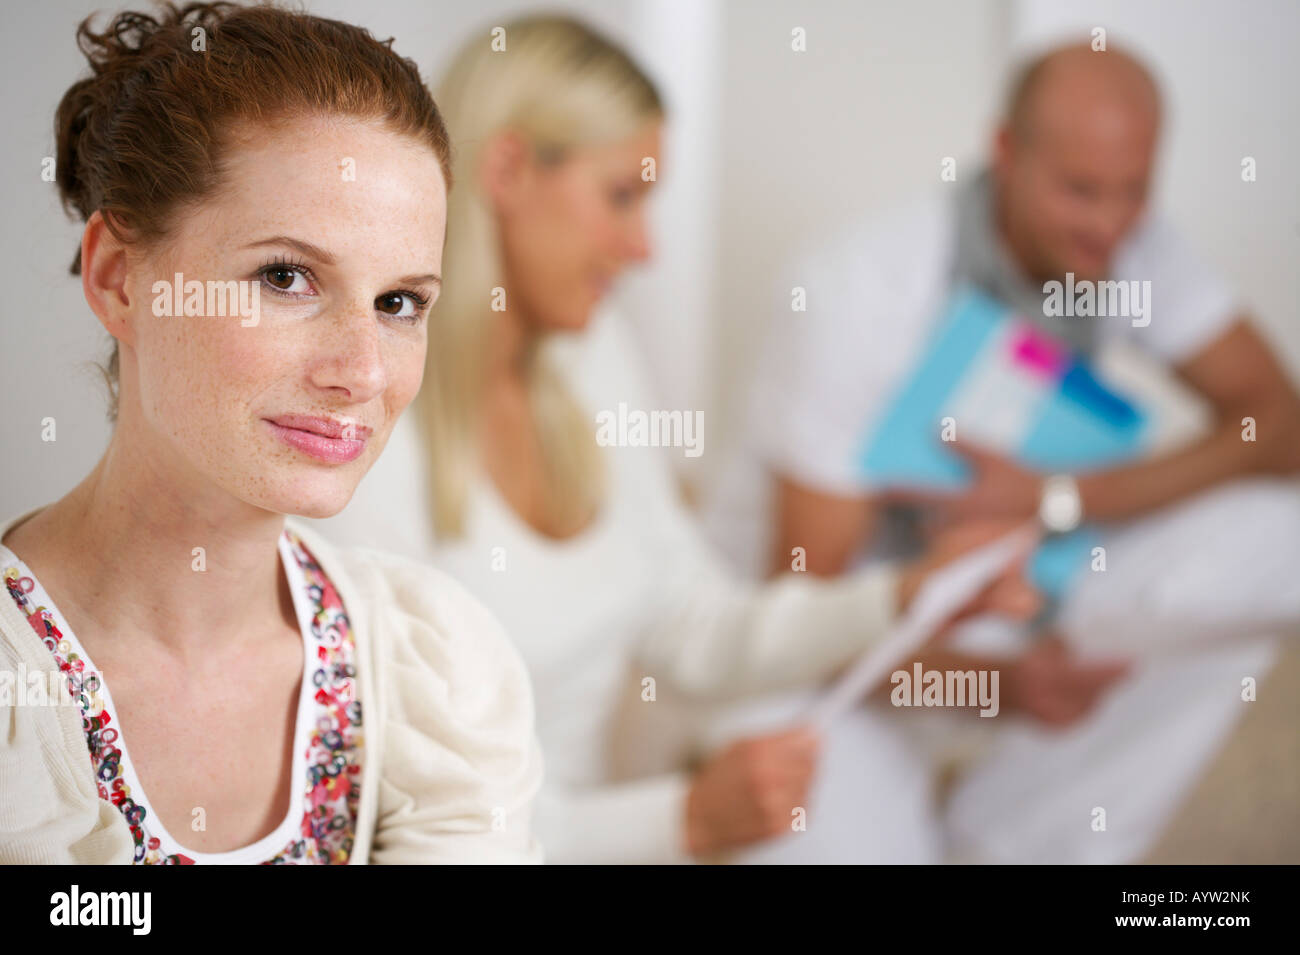 Young woman smiling at camera - Stock Image